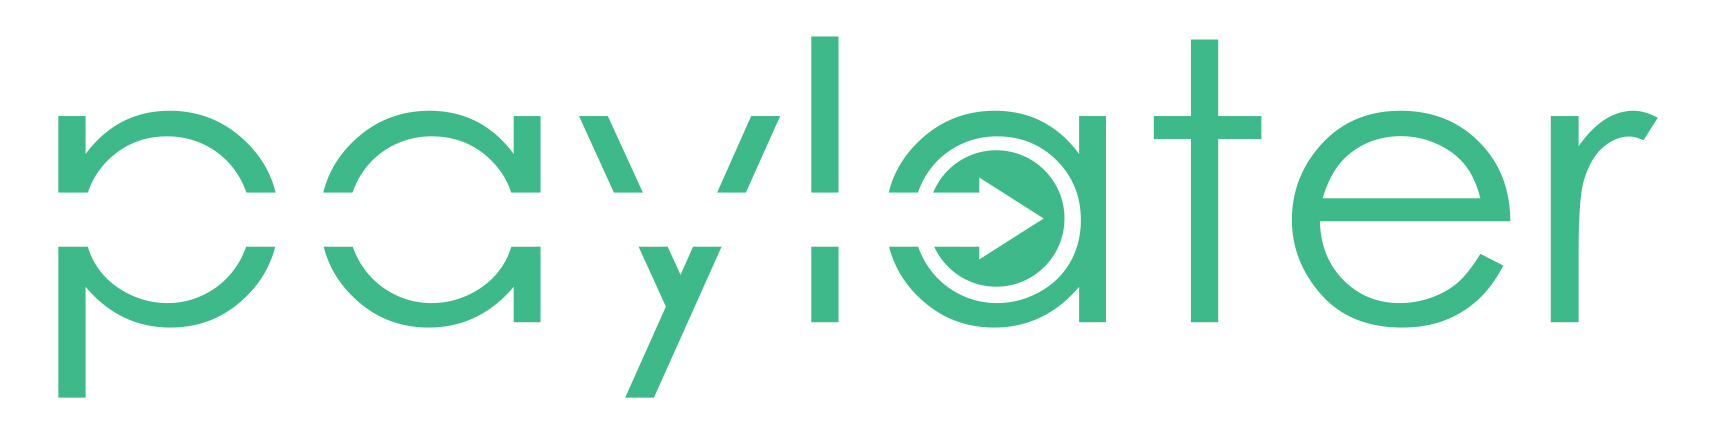 Paylater logo full